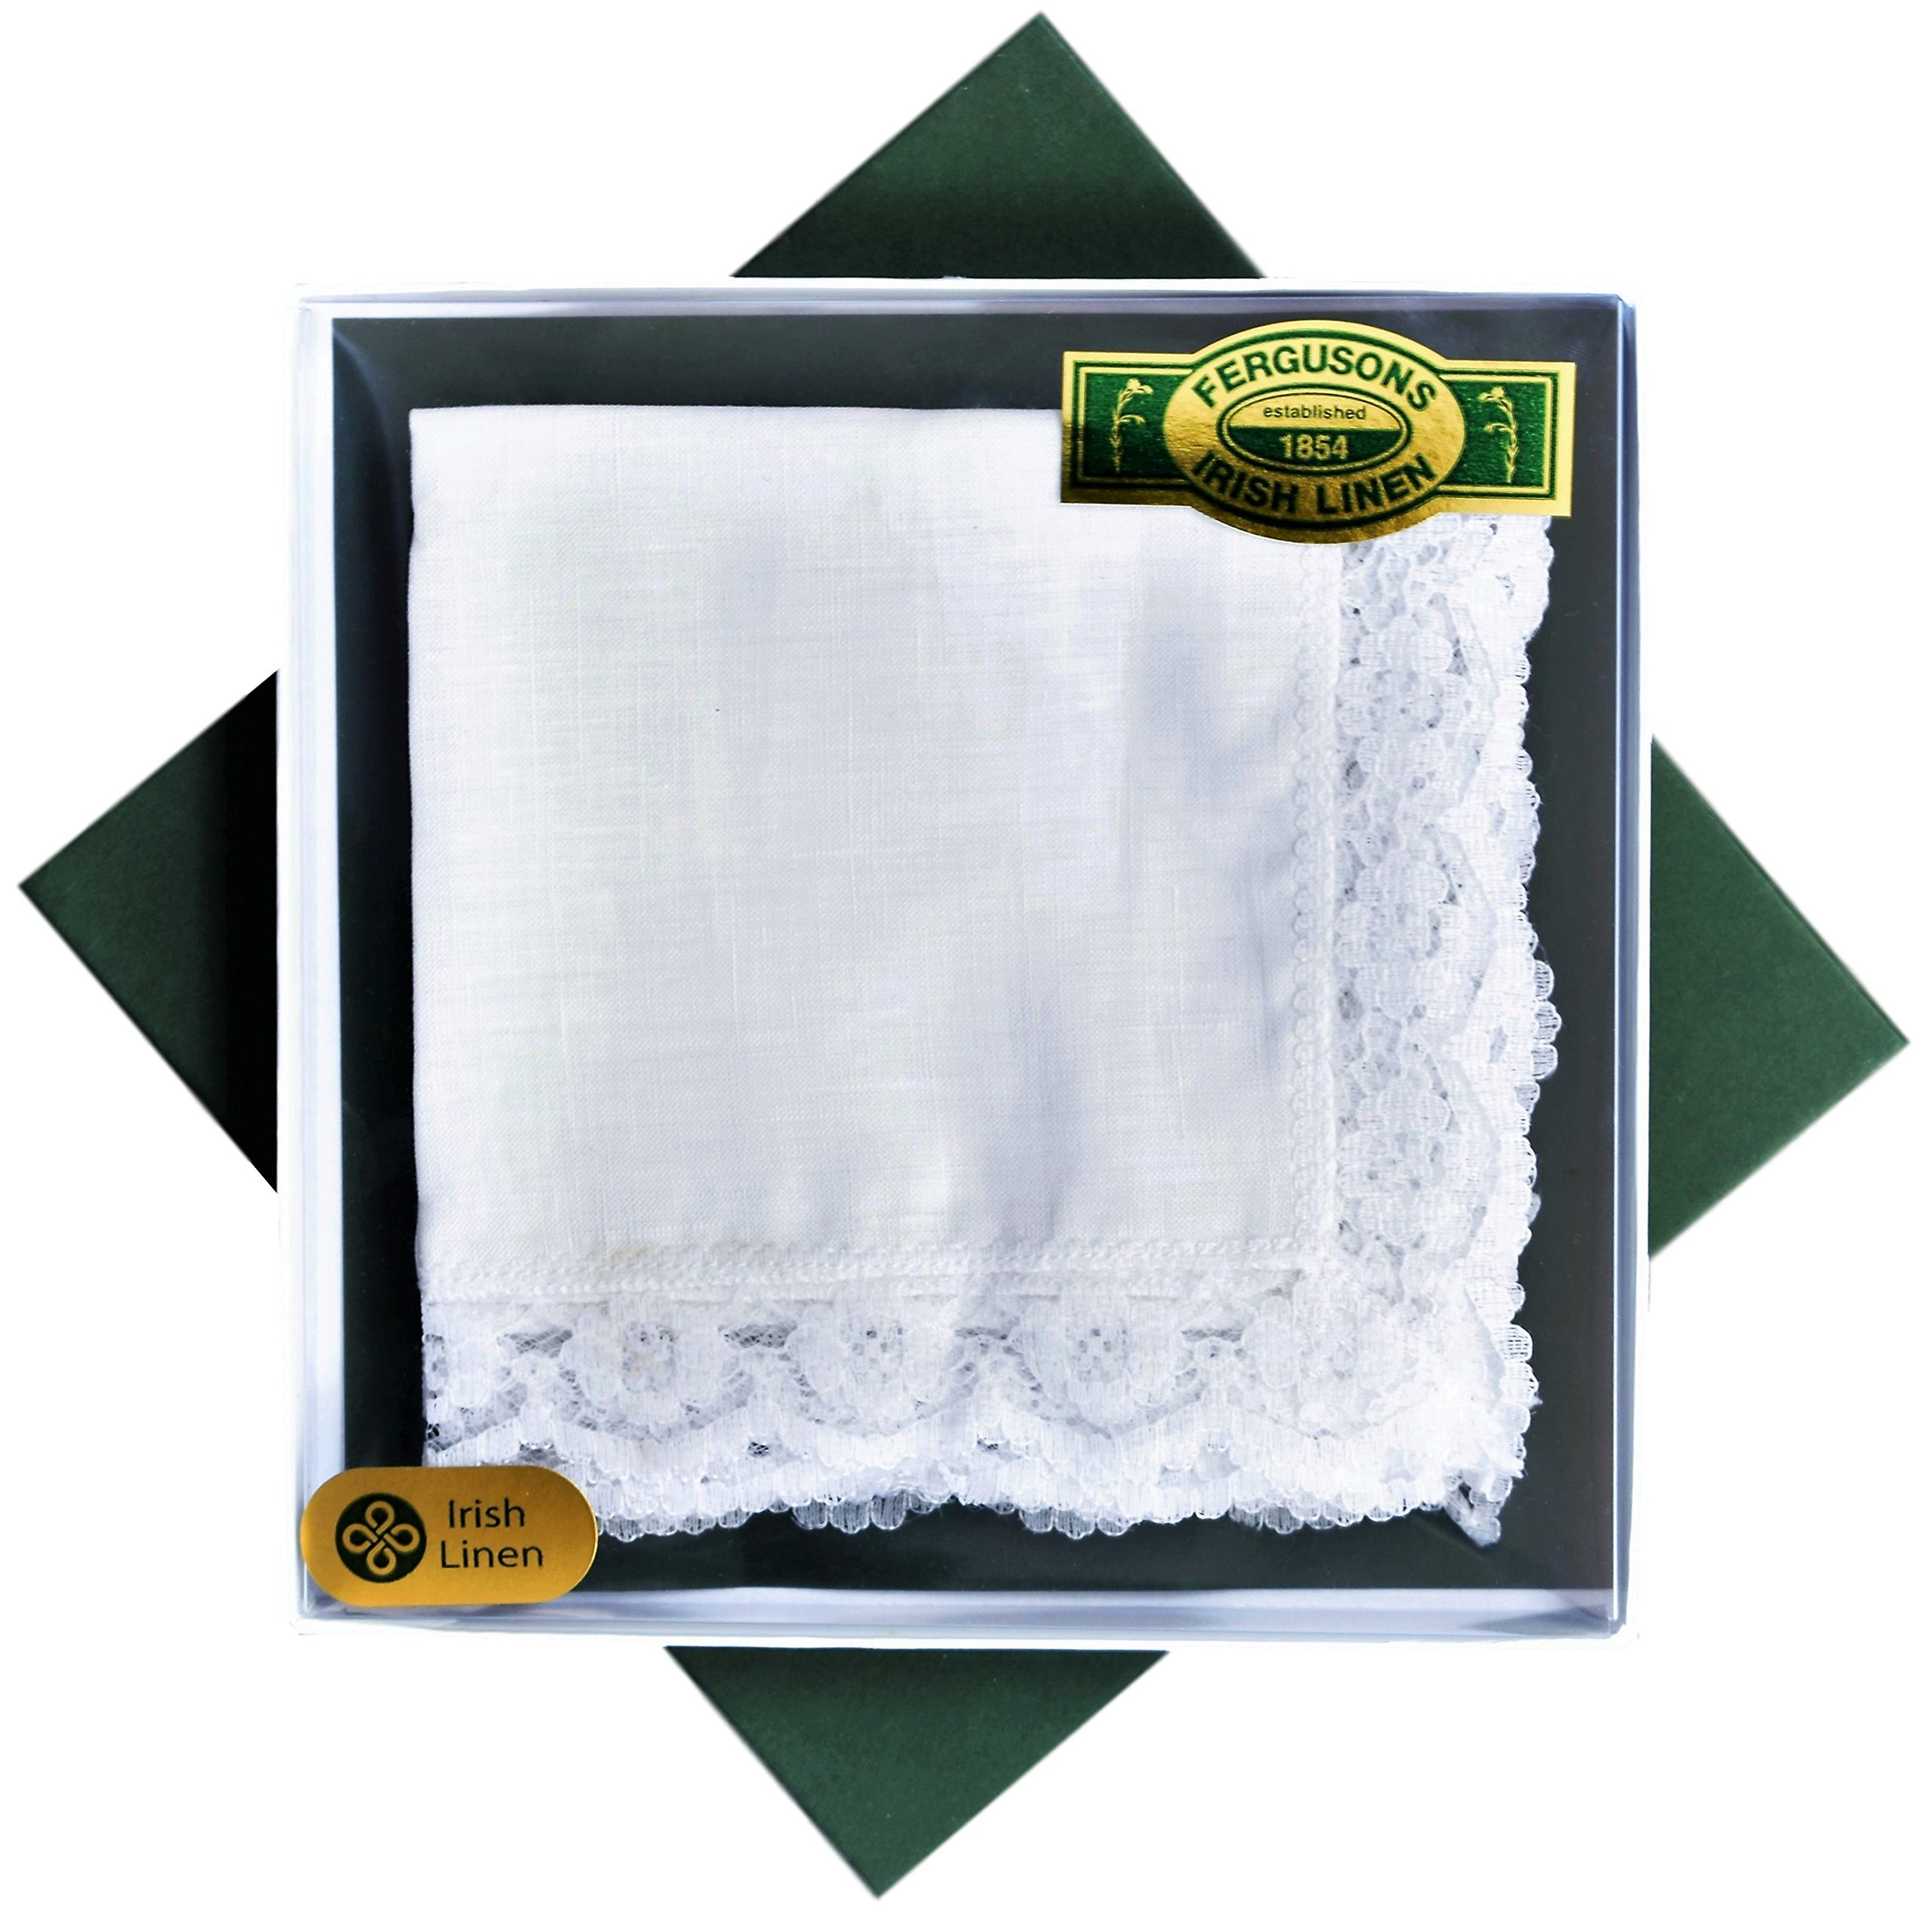 Thomas Ferguson - Ladies White Irish Linen Handkerchief - Pack of 3 In Gift Box by Thomas Ferguson Irish Linen (Image #2)